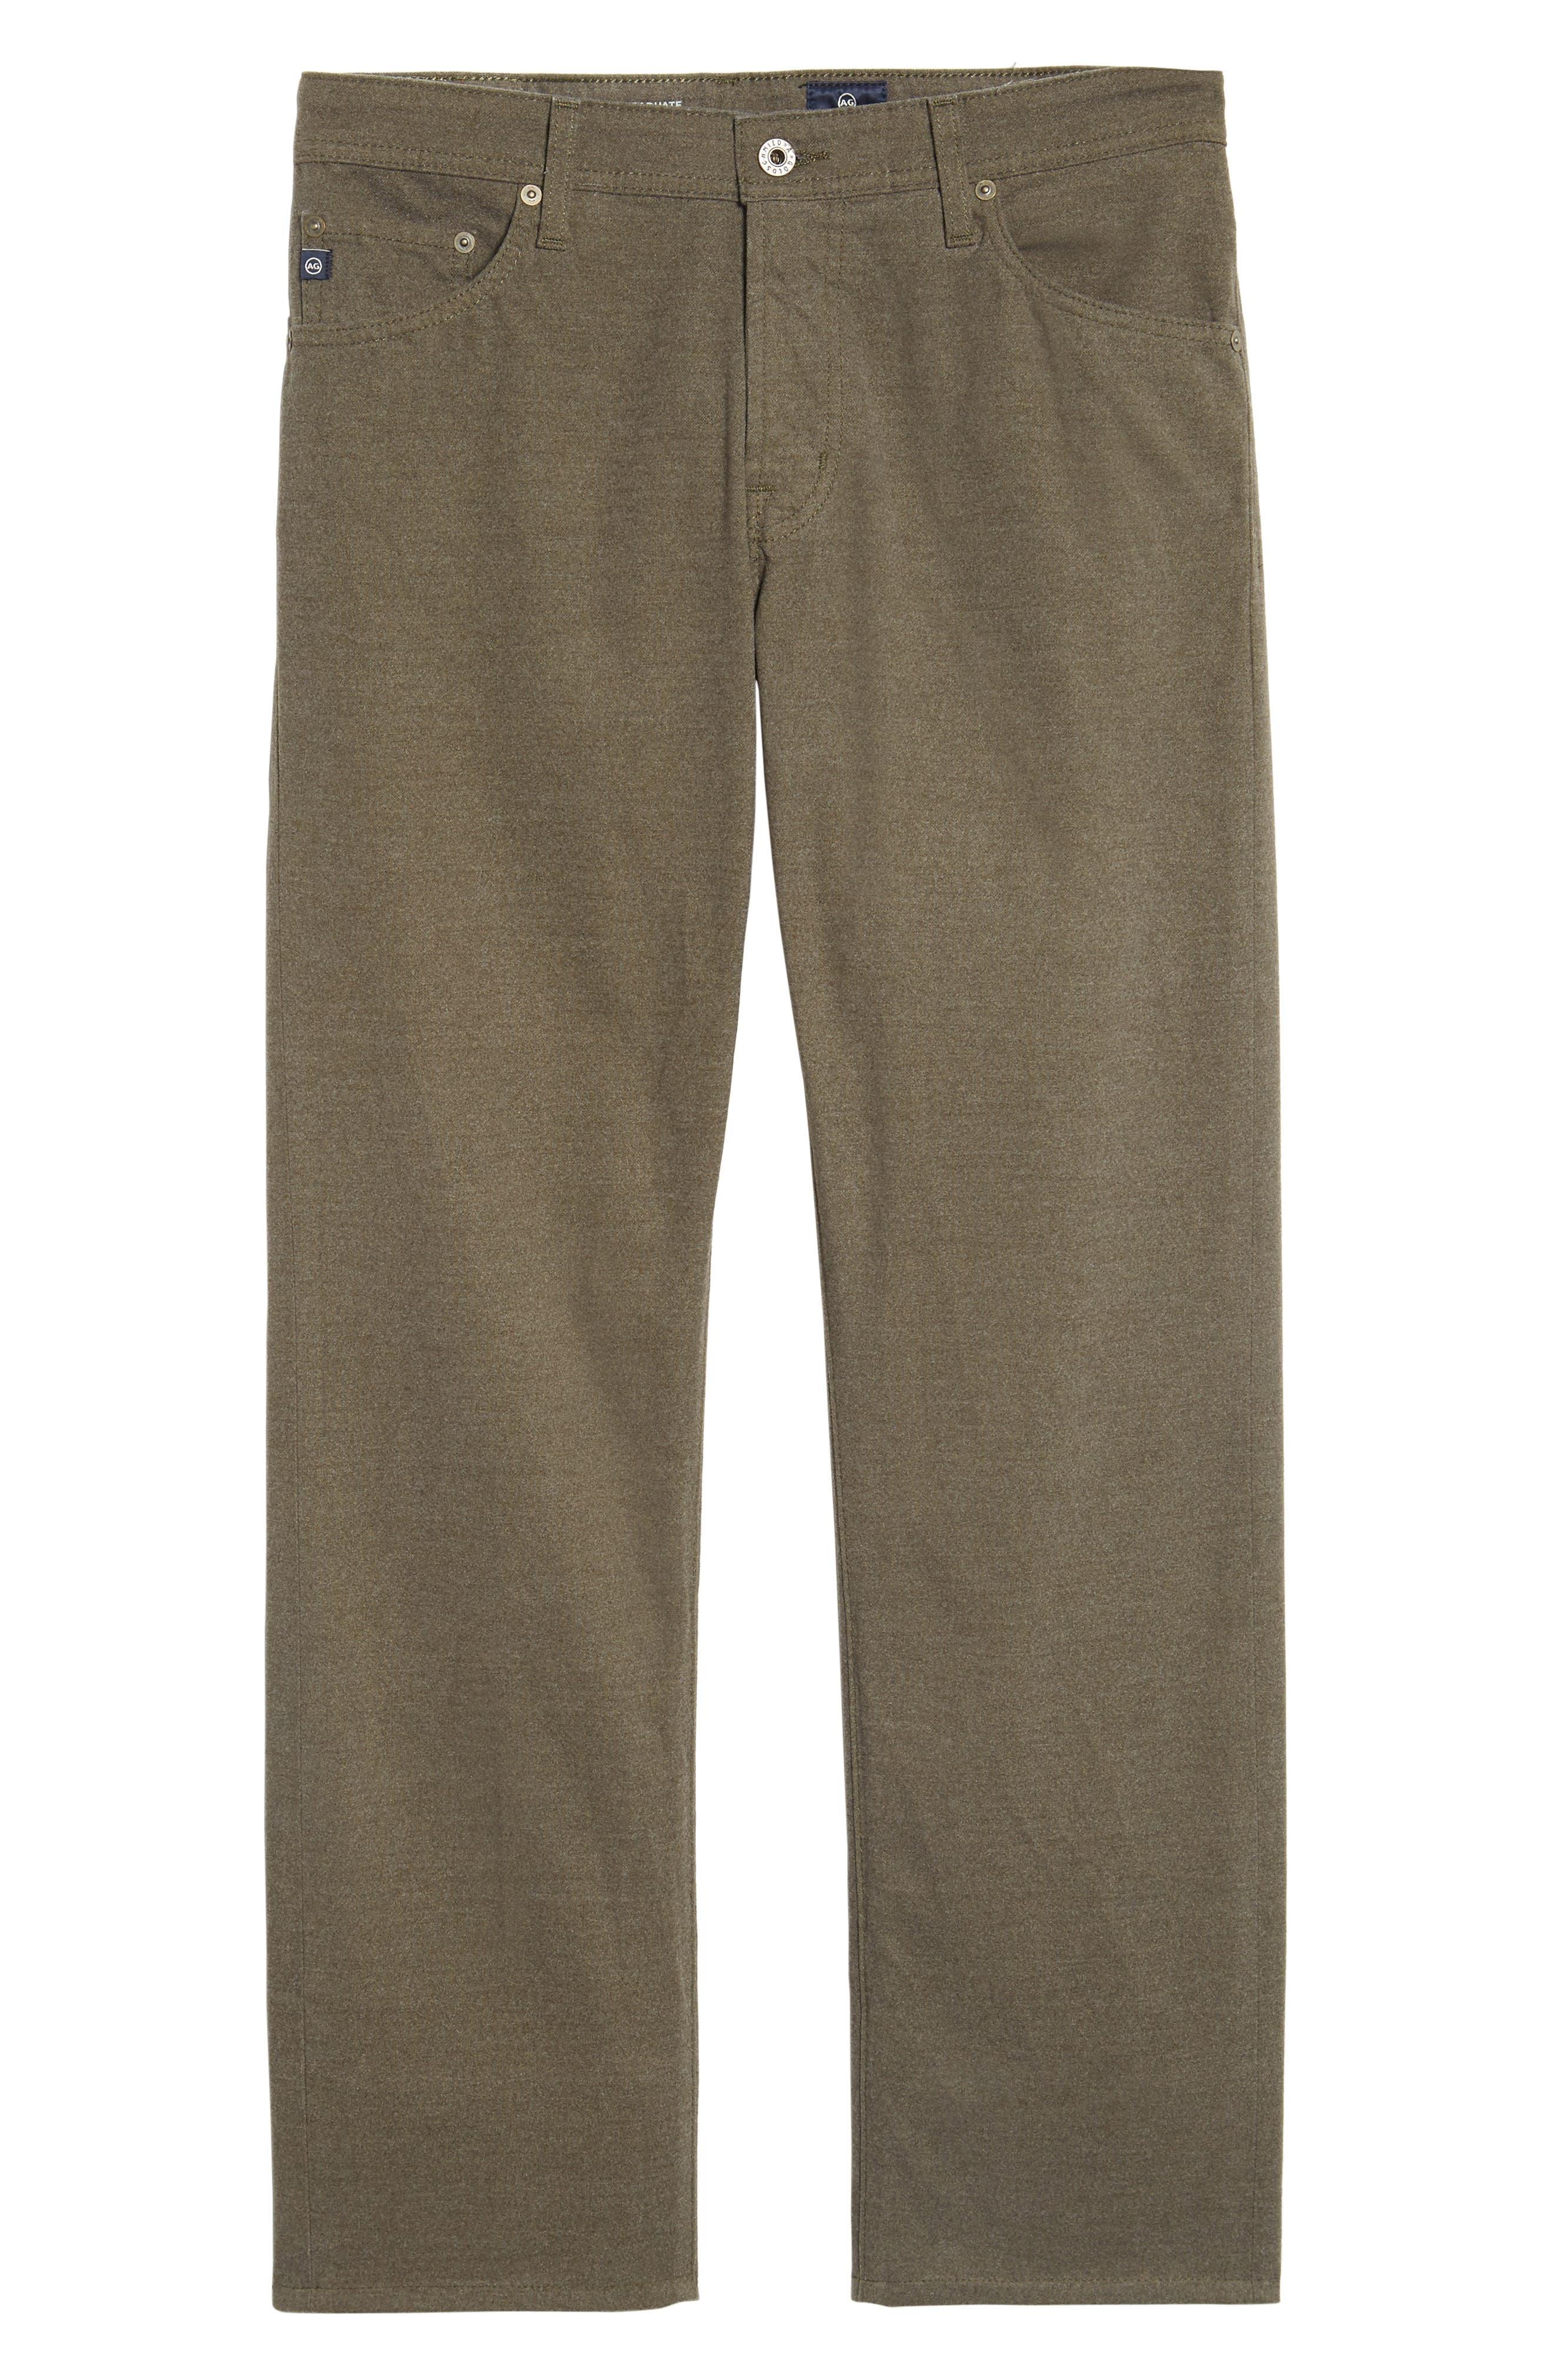 Graduate Tailored Five-Pocket Straight Leg Pants,                             Alternate thumbnail 6, color,                             CLIMBING IVY